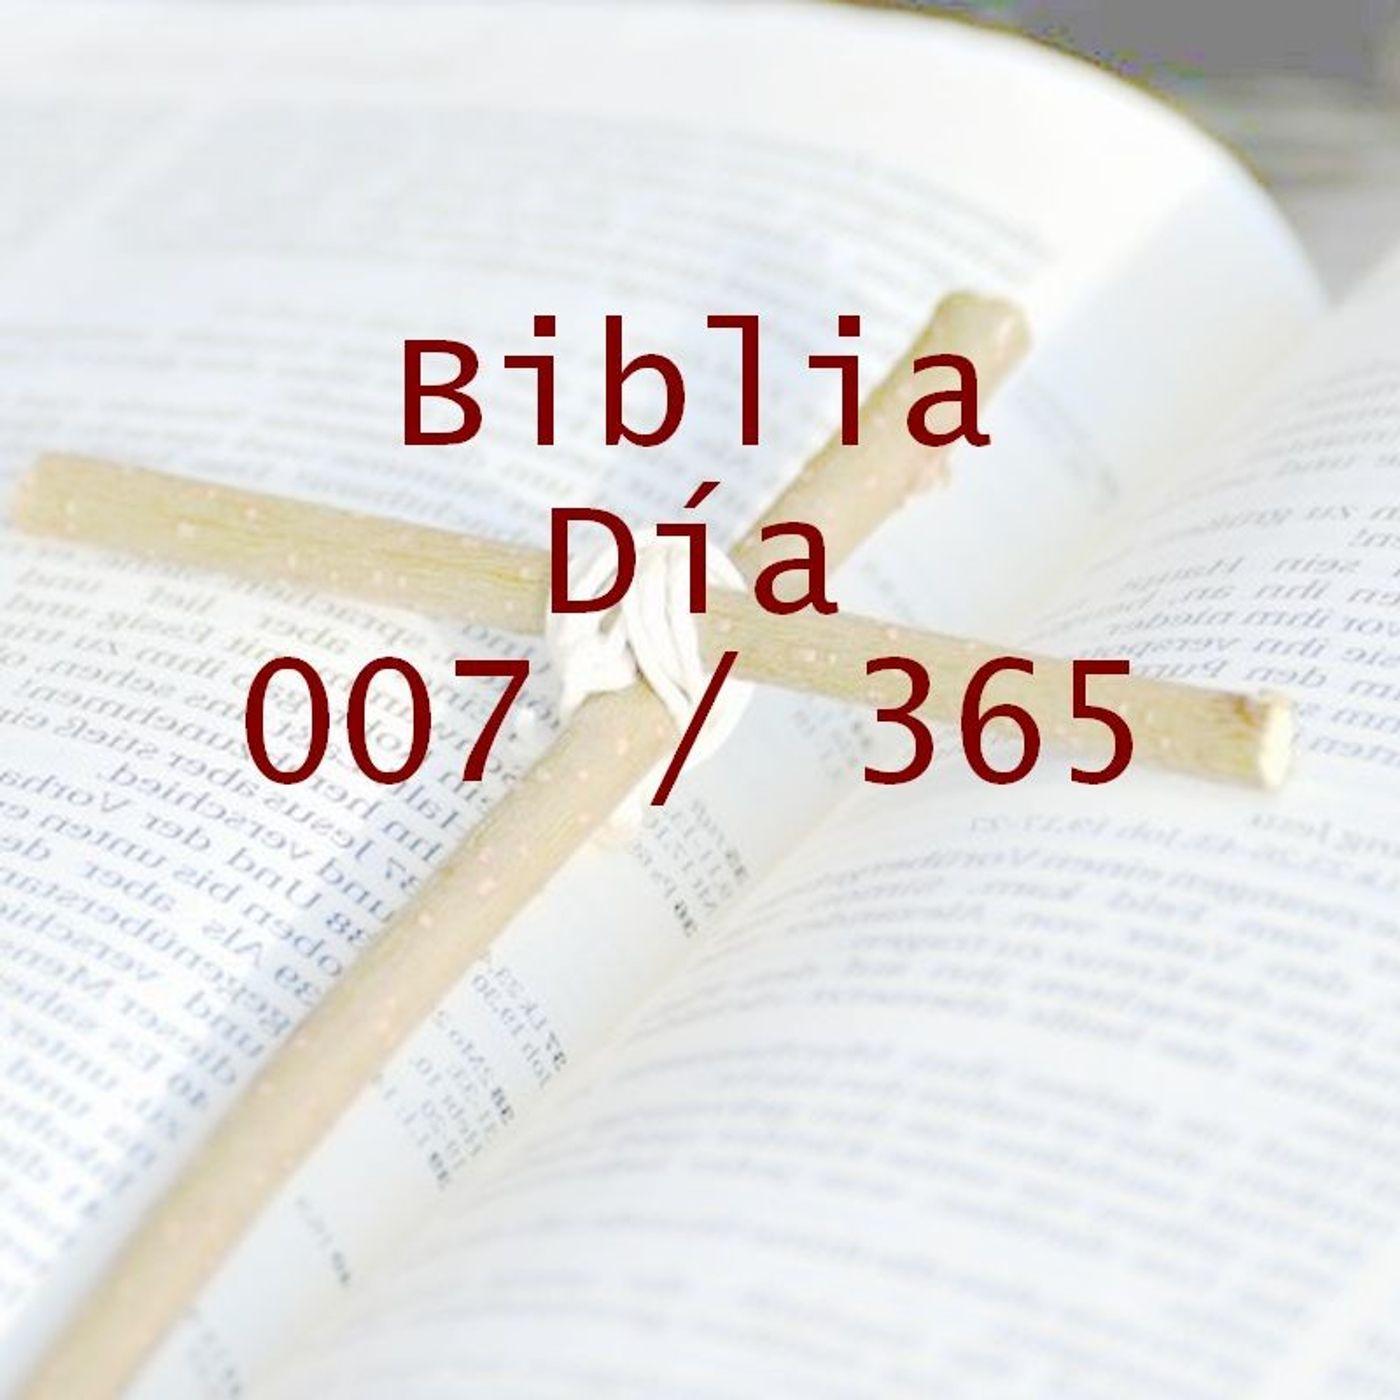 365 dias para la Biblia - Dia 007